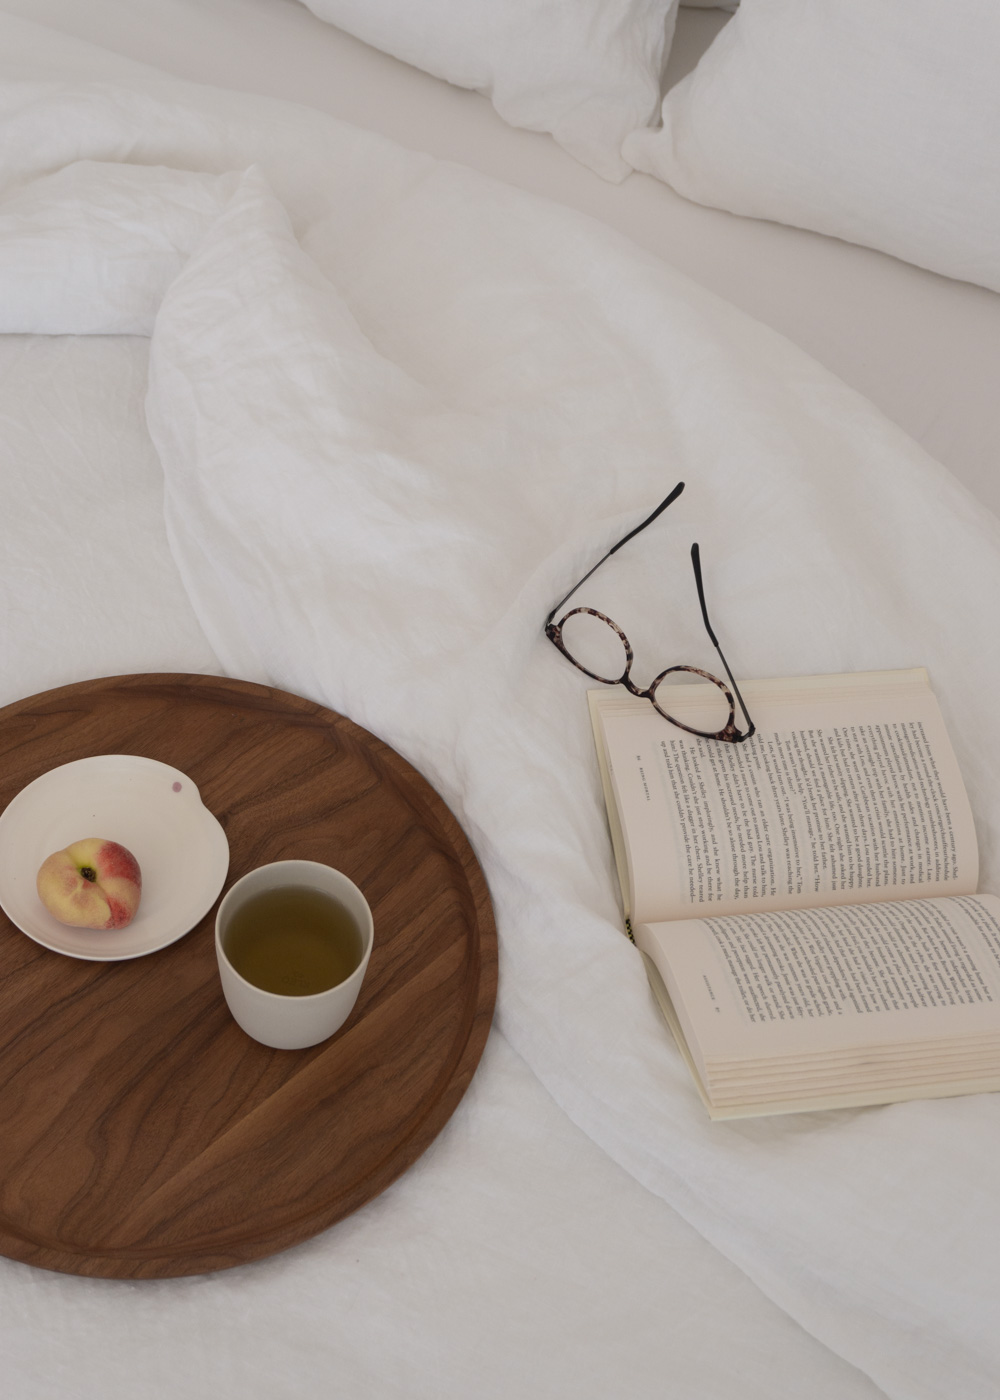 Bedfolk Linen Bedding Calming Bedroom Beige White Scandi Interior Berlin Minimalist Apartment Scandinavian Home Slow Living Neutral Aesthetic Inspo Rg Daily Blog 38 Rg Daily